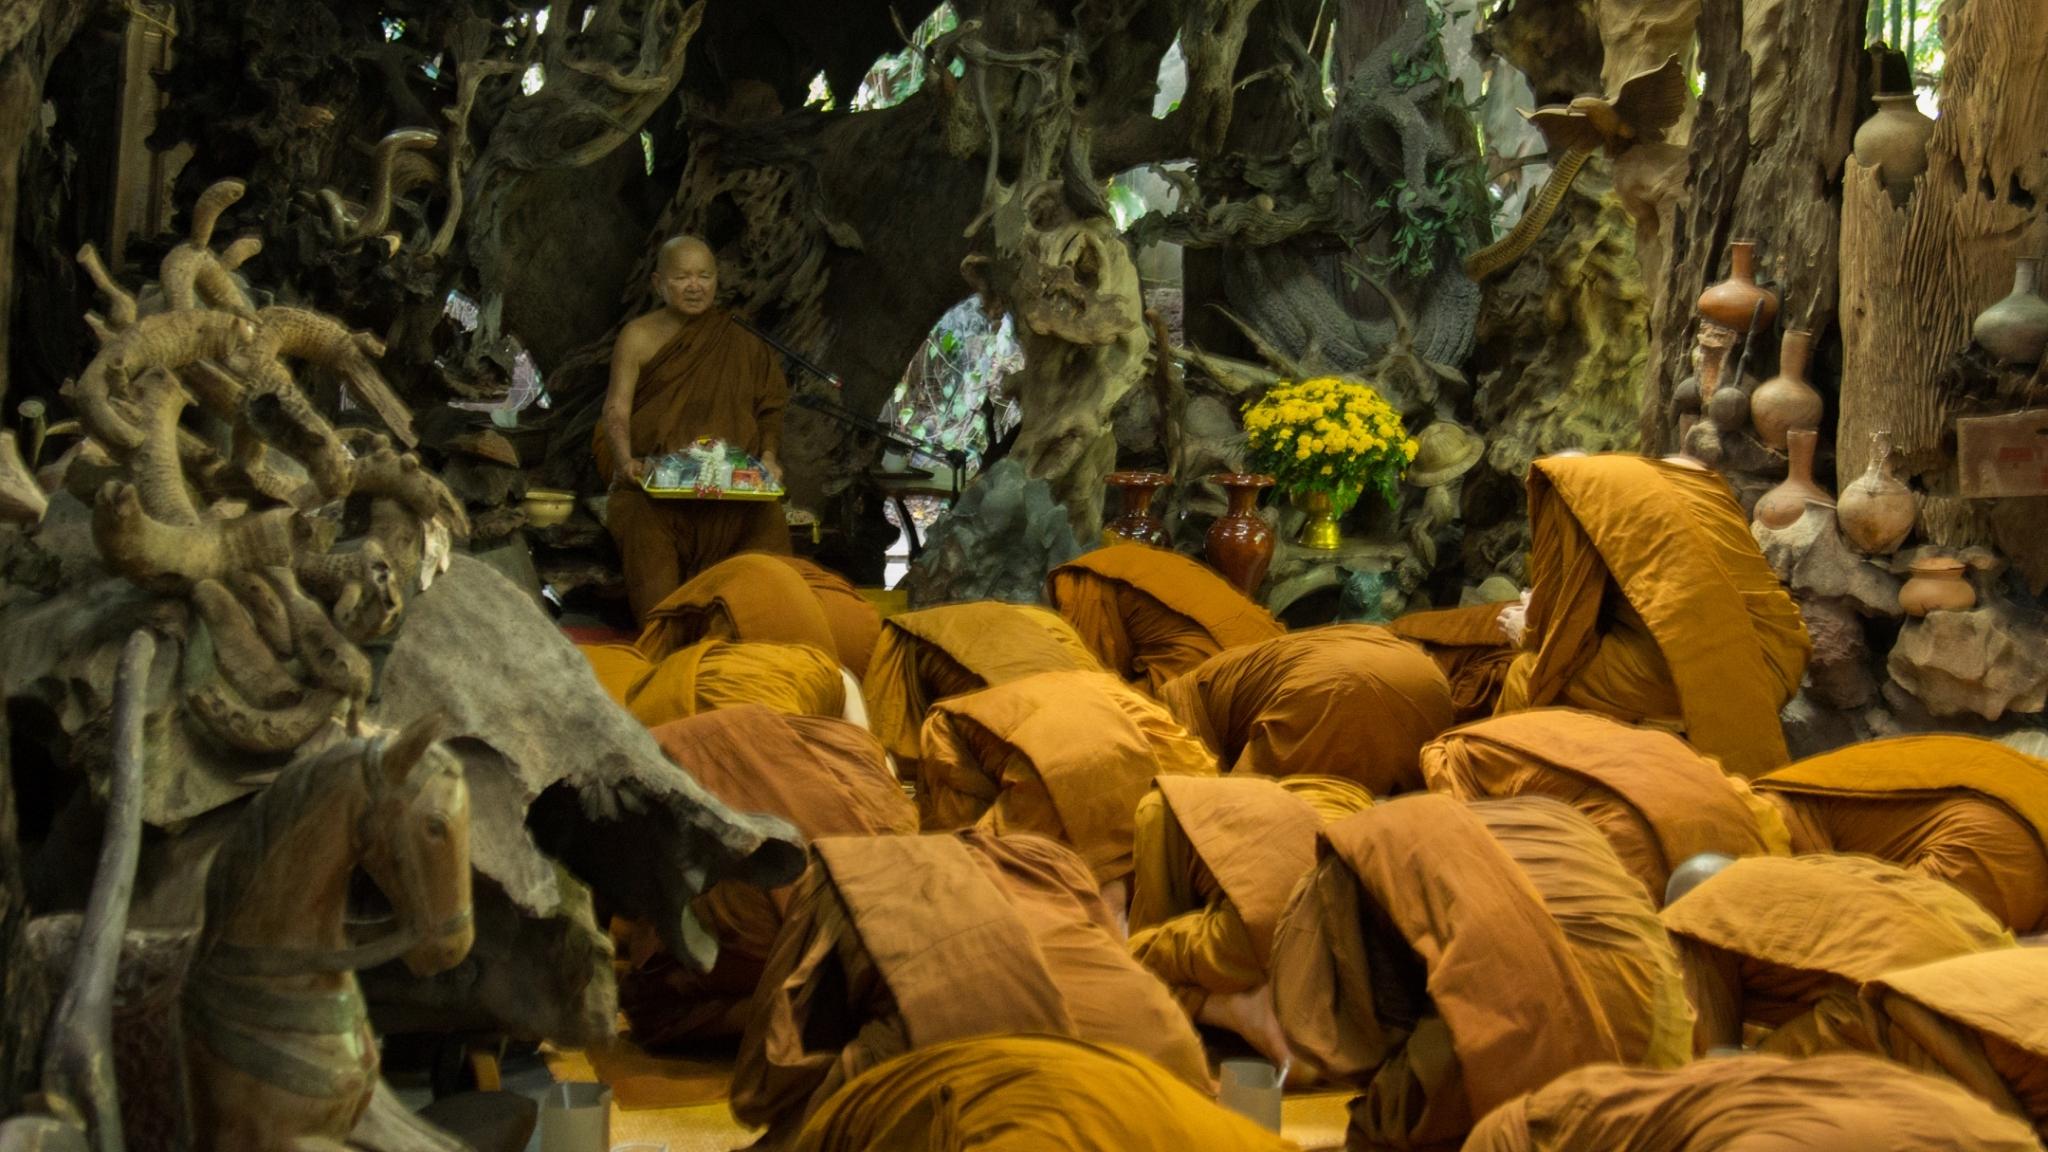 at Wat Pah Sai Ngam (Luang Por Anek)